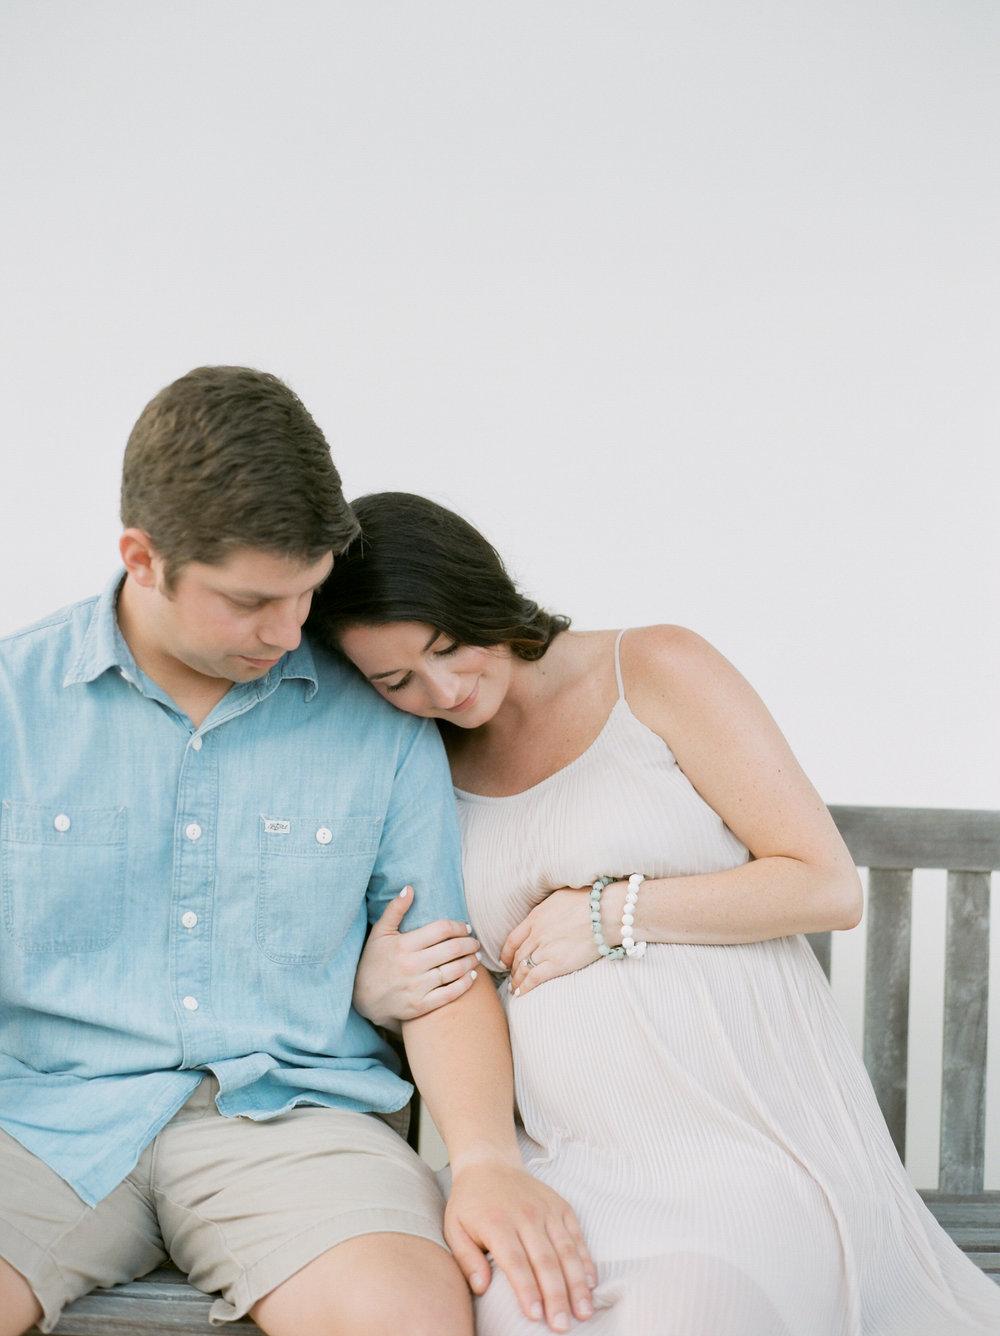 victoria austin designs neautral maternity kaylie b poplin photography